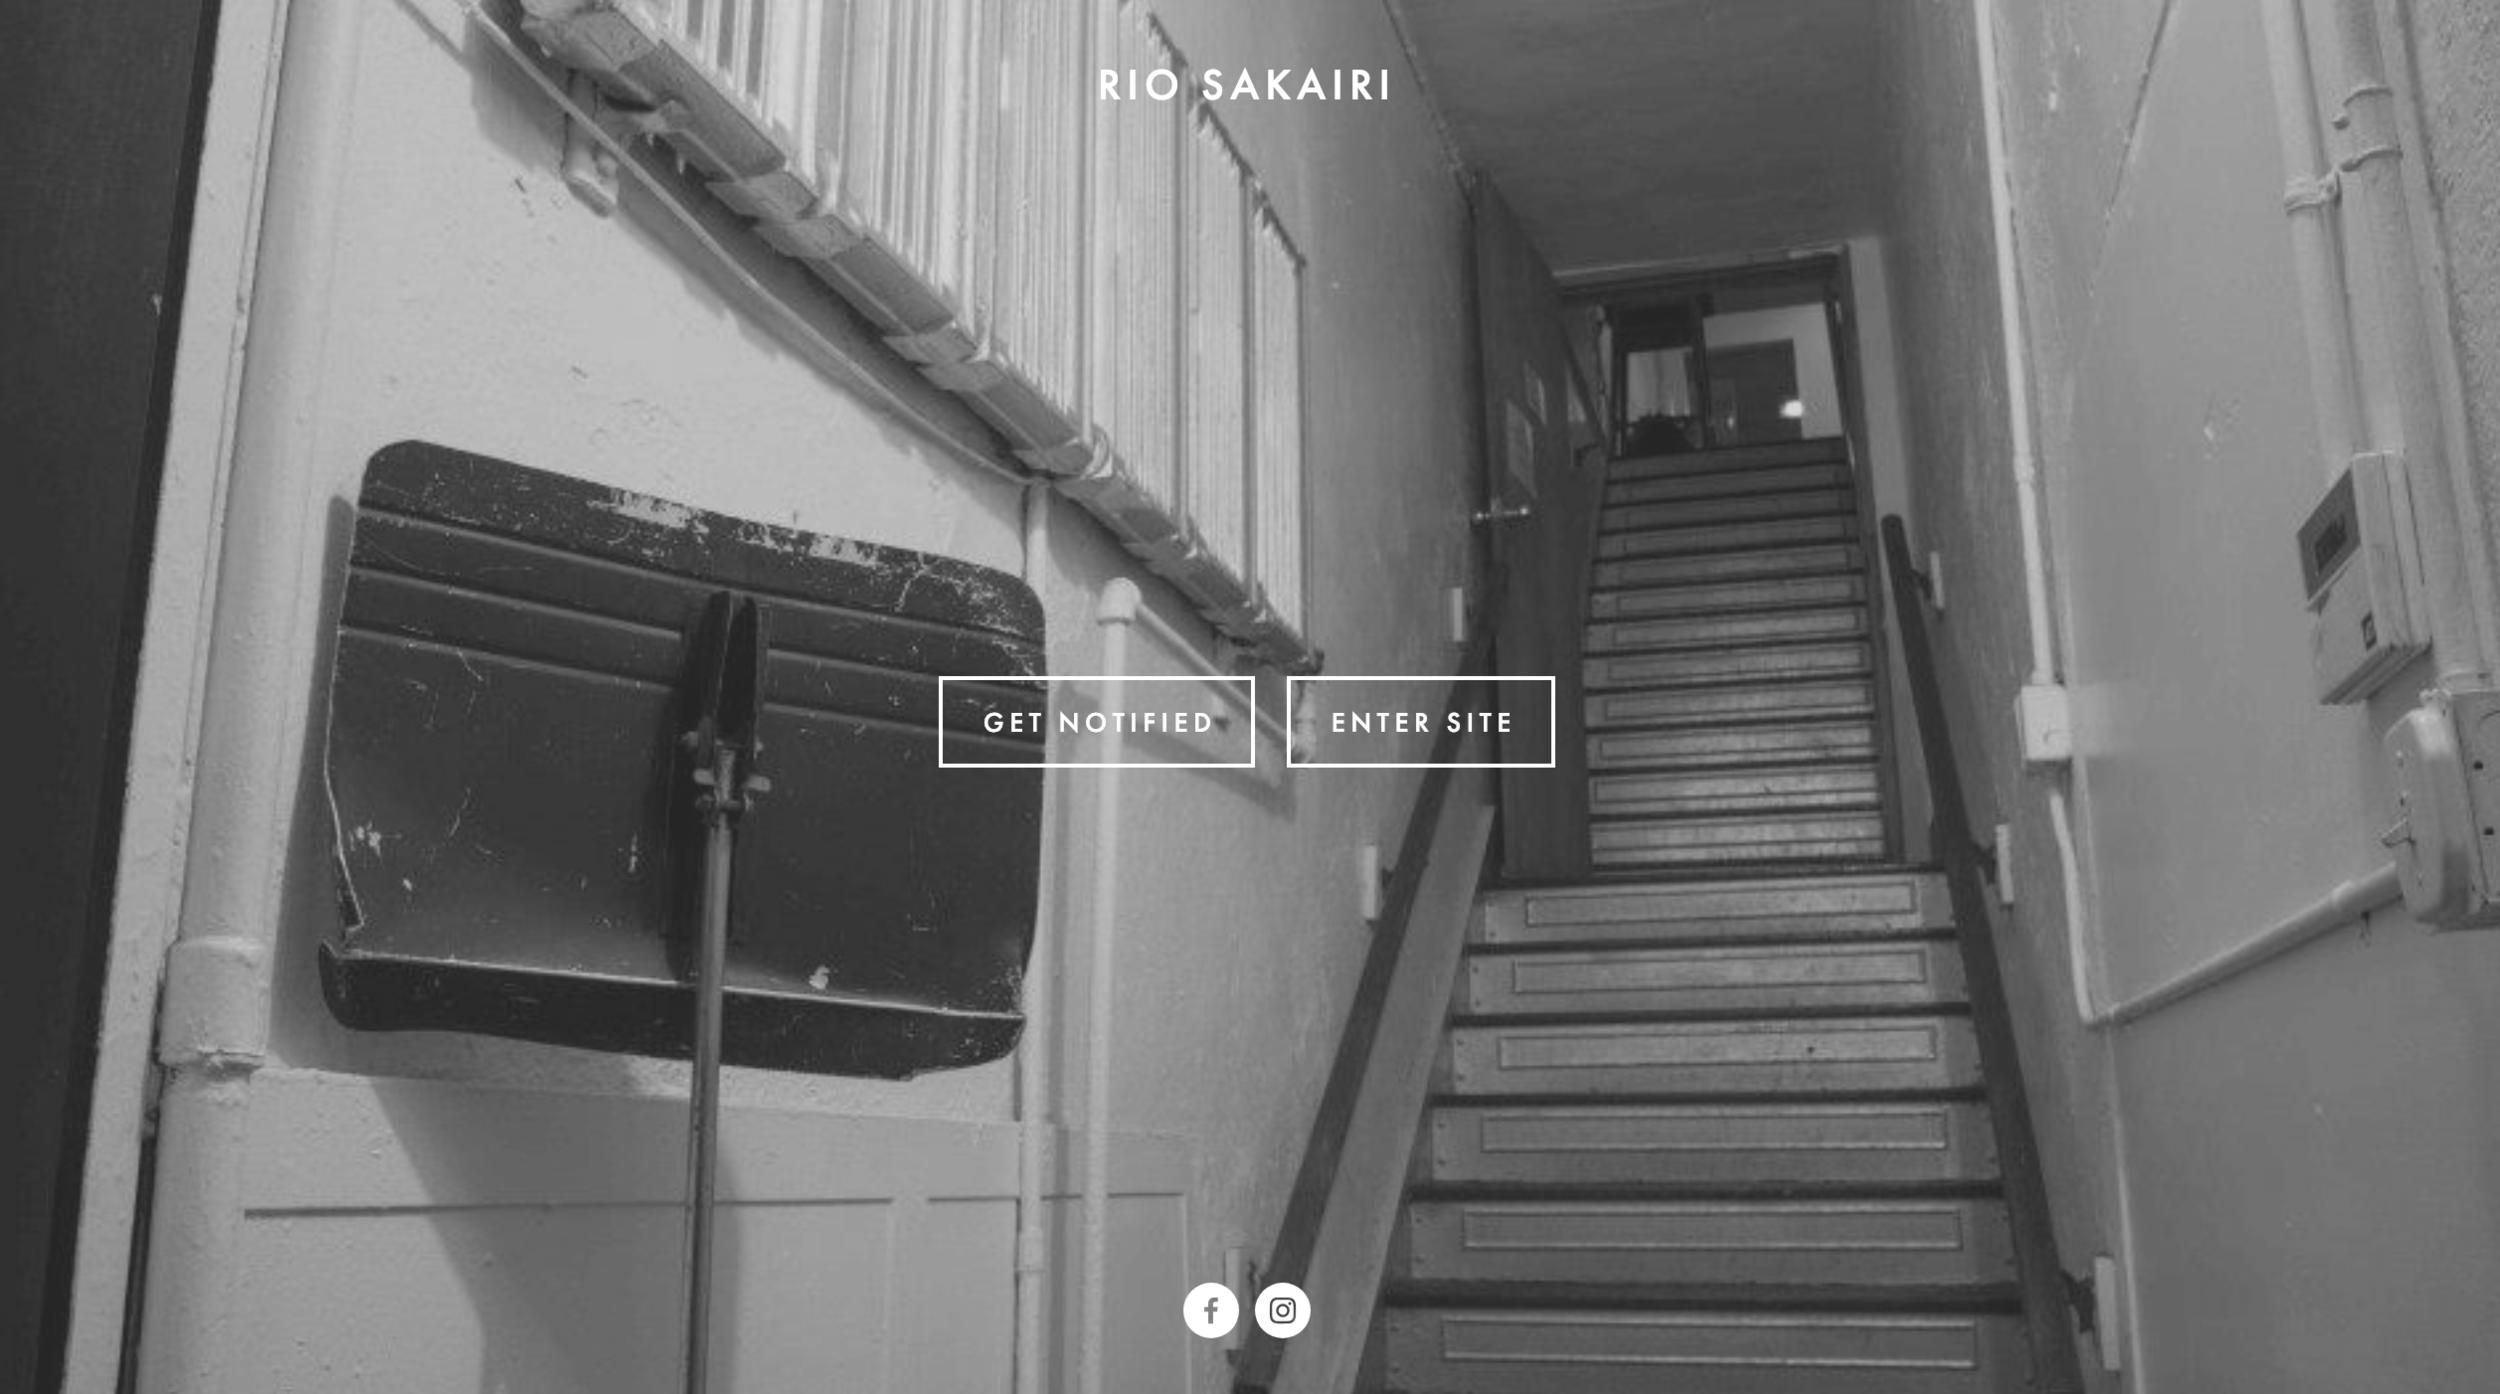 Rio Sakairi | Personal Blog